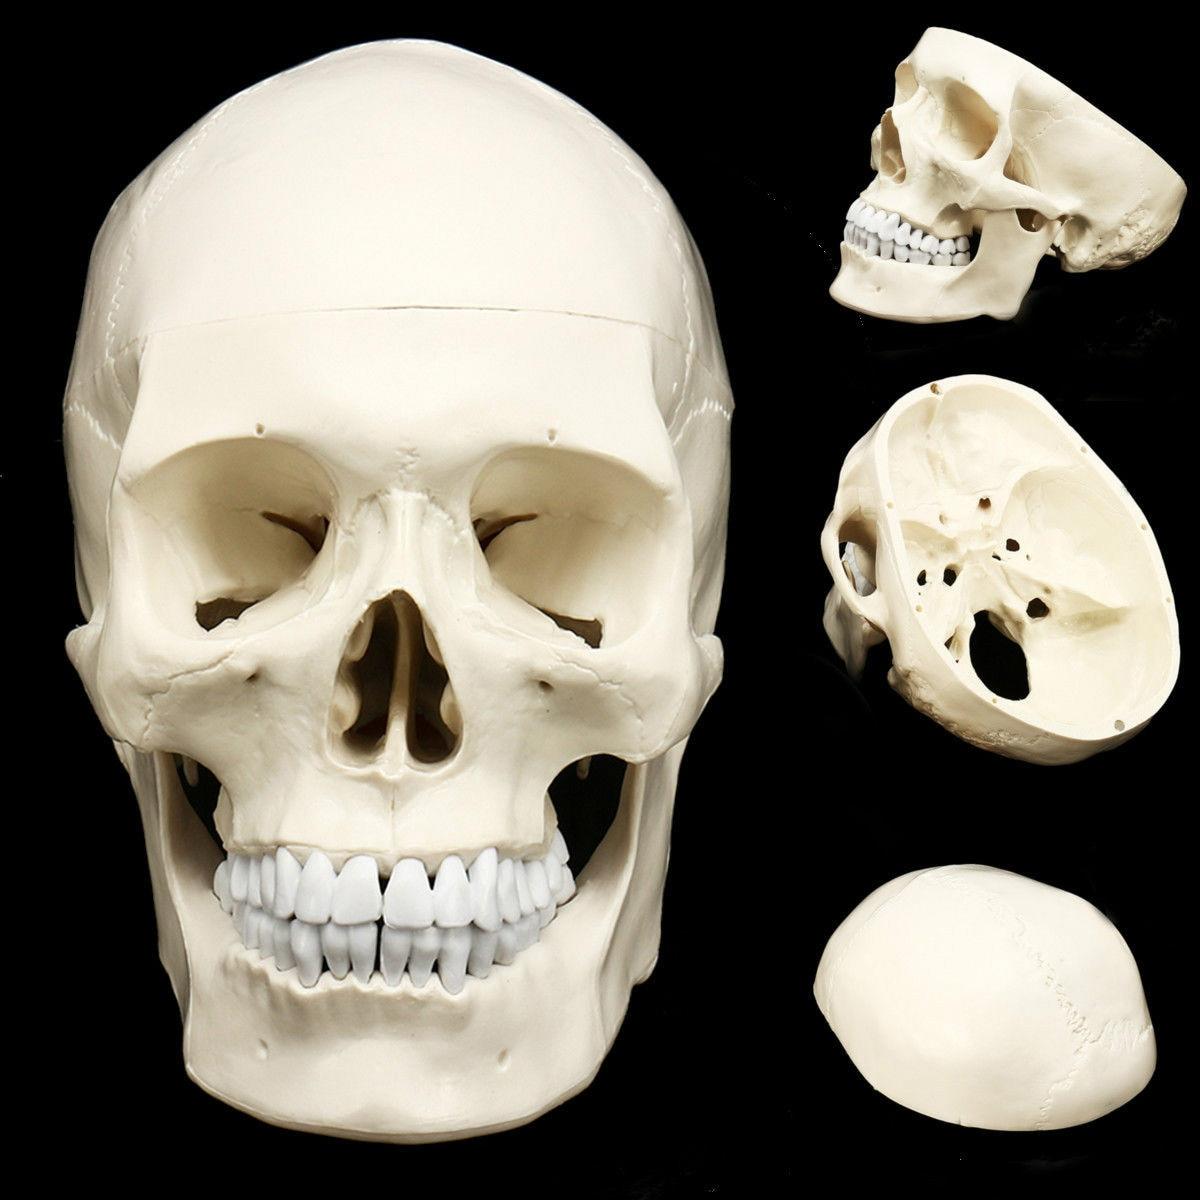 Life Size Human Anatomical Anatomy Resin Head Skeleton Skull Teaching Model School Supplies high quality life size human skeleton model 180cm tall